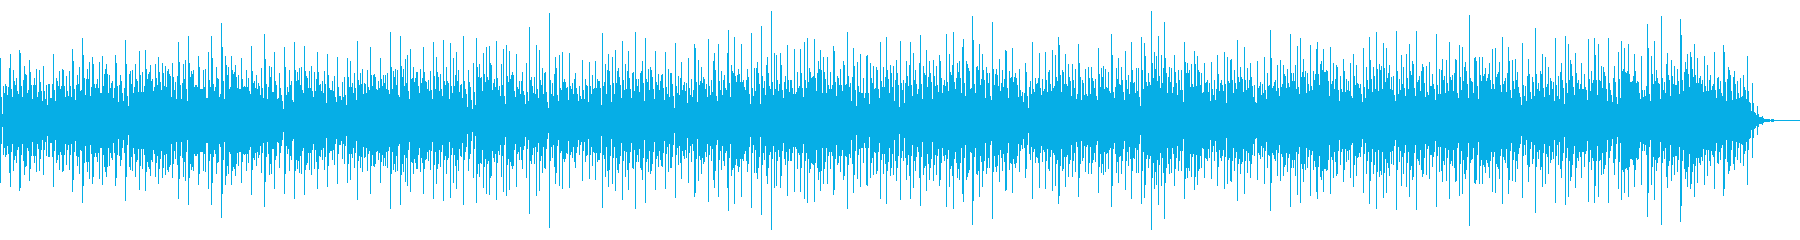 Corporate Synth 127の再生済みの波形